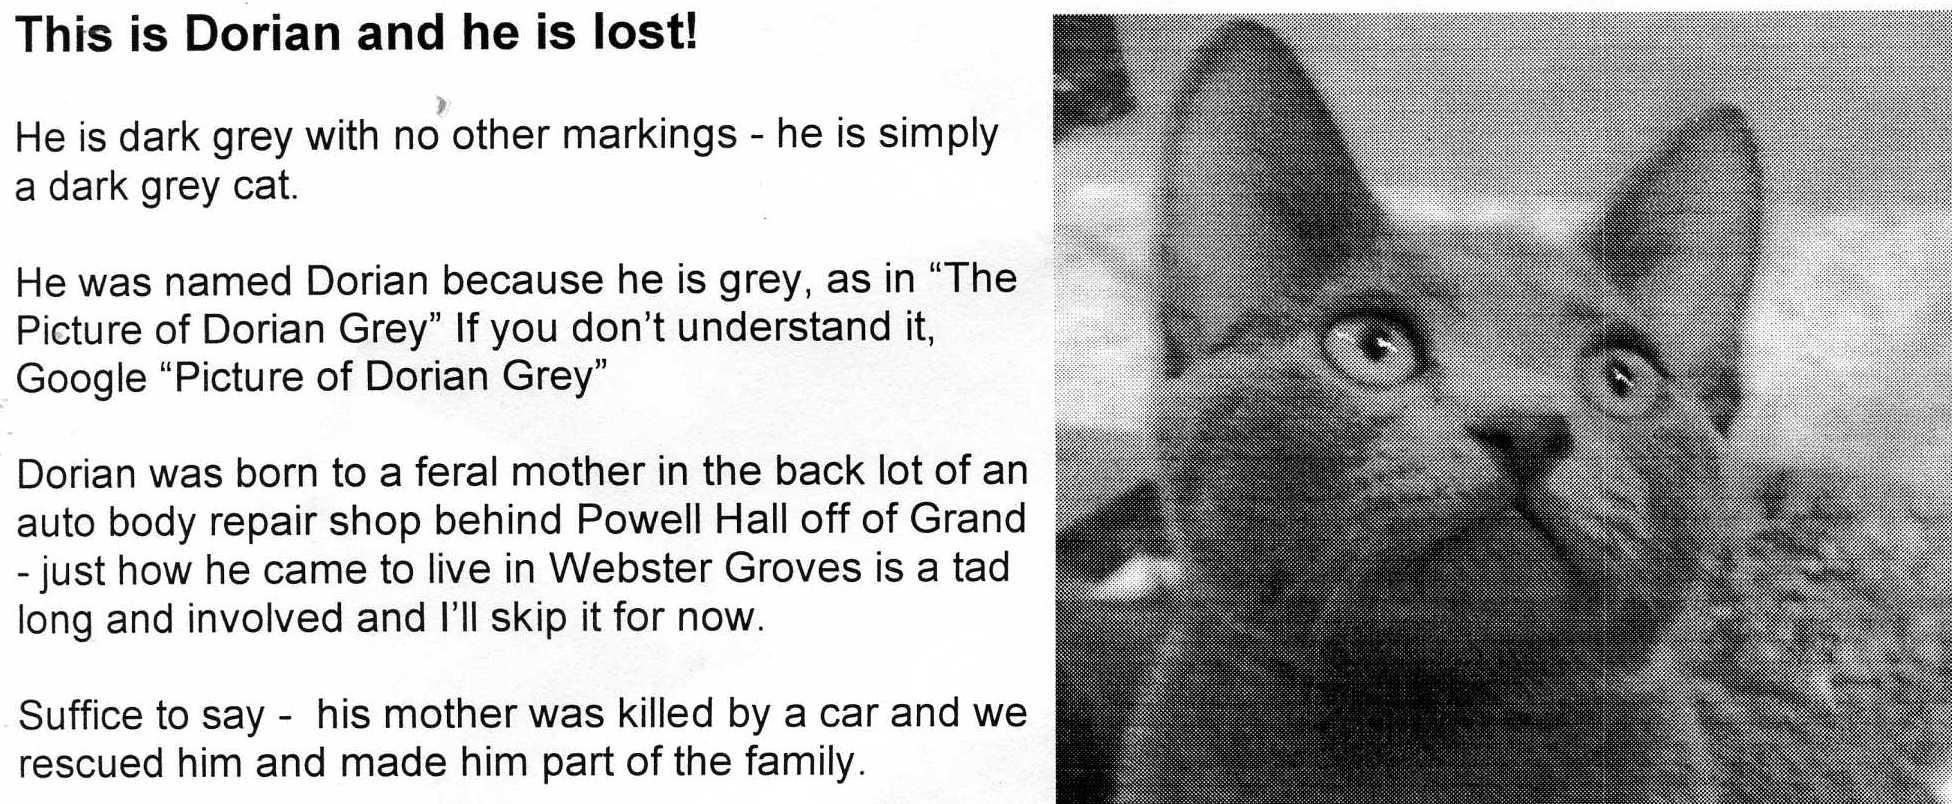 A Lost Cat Broadsheet